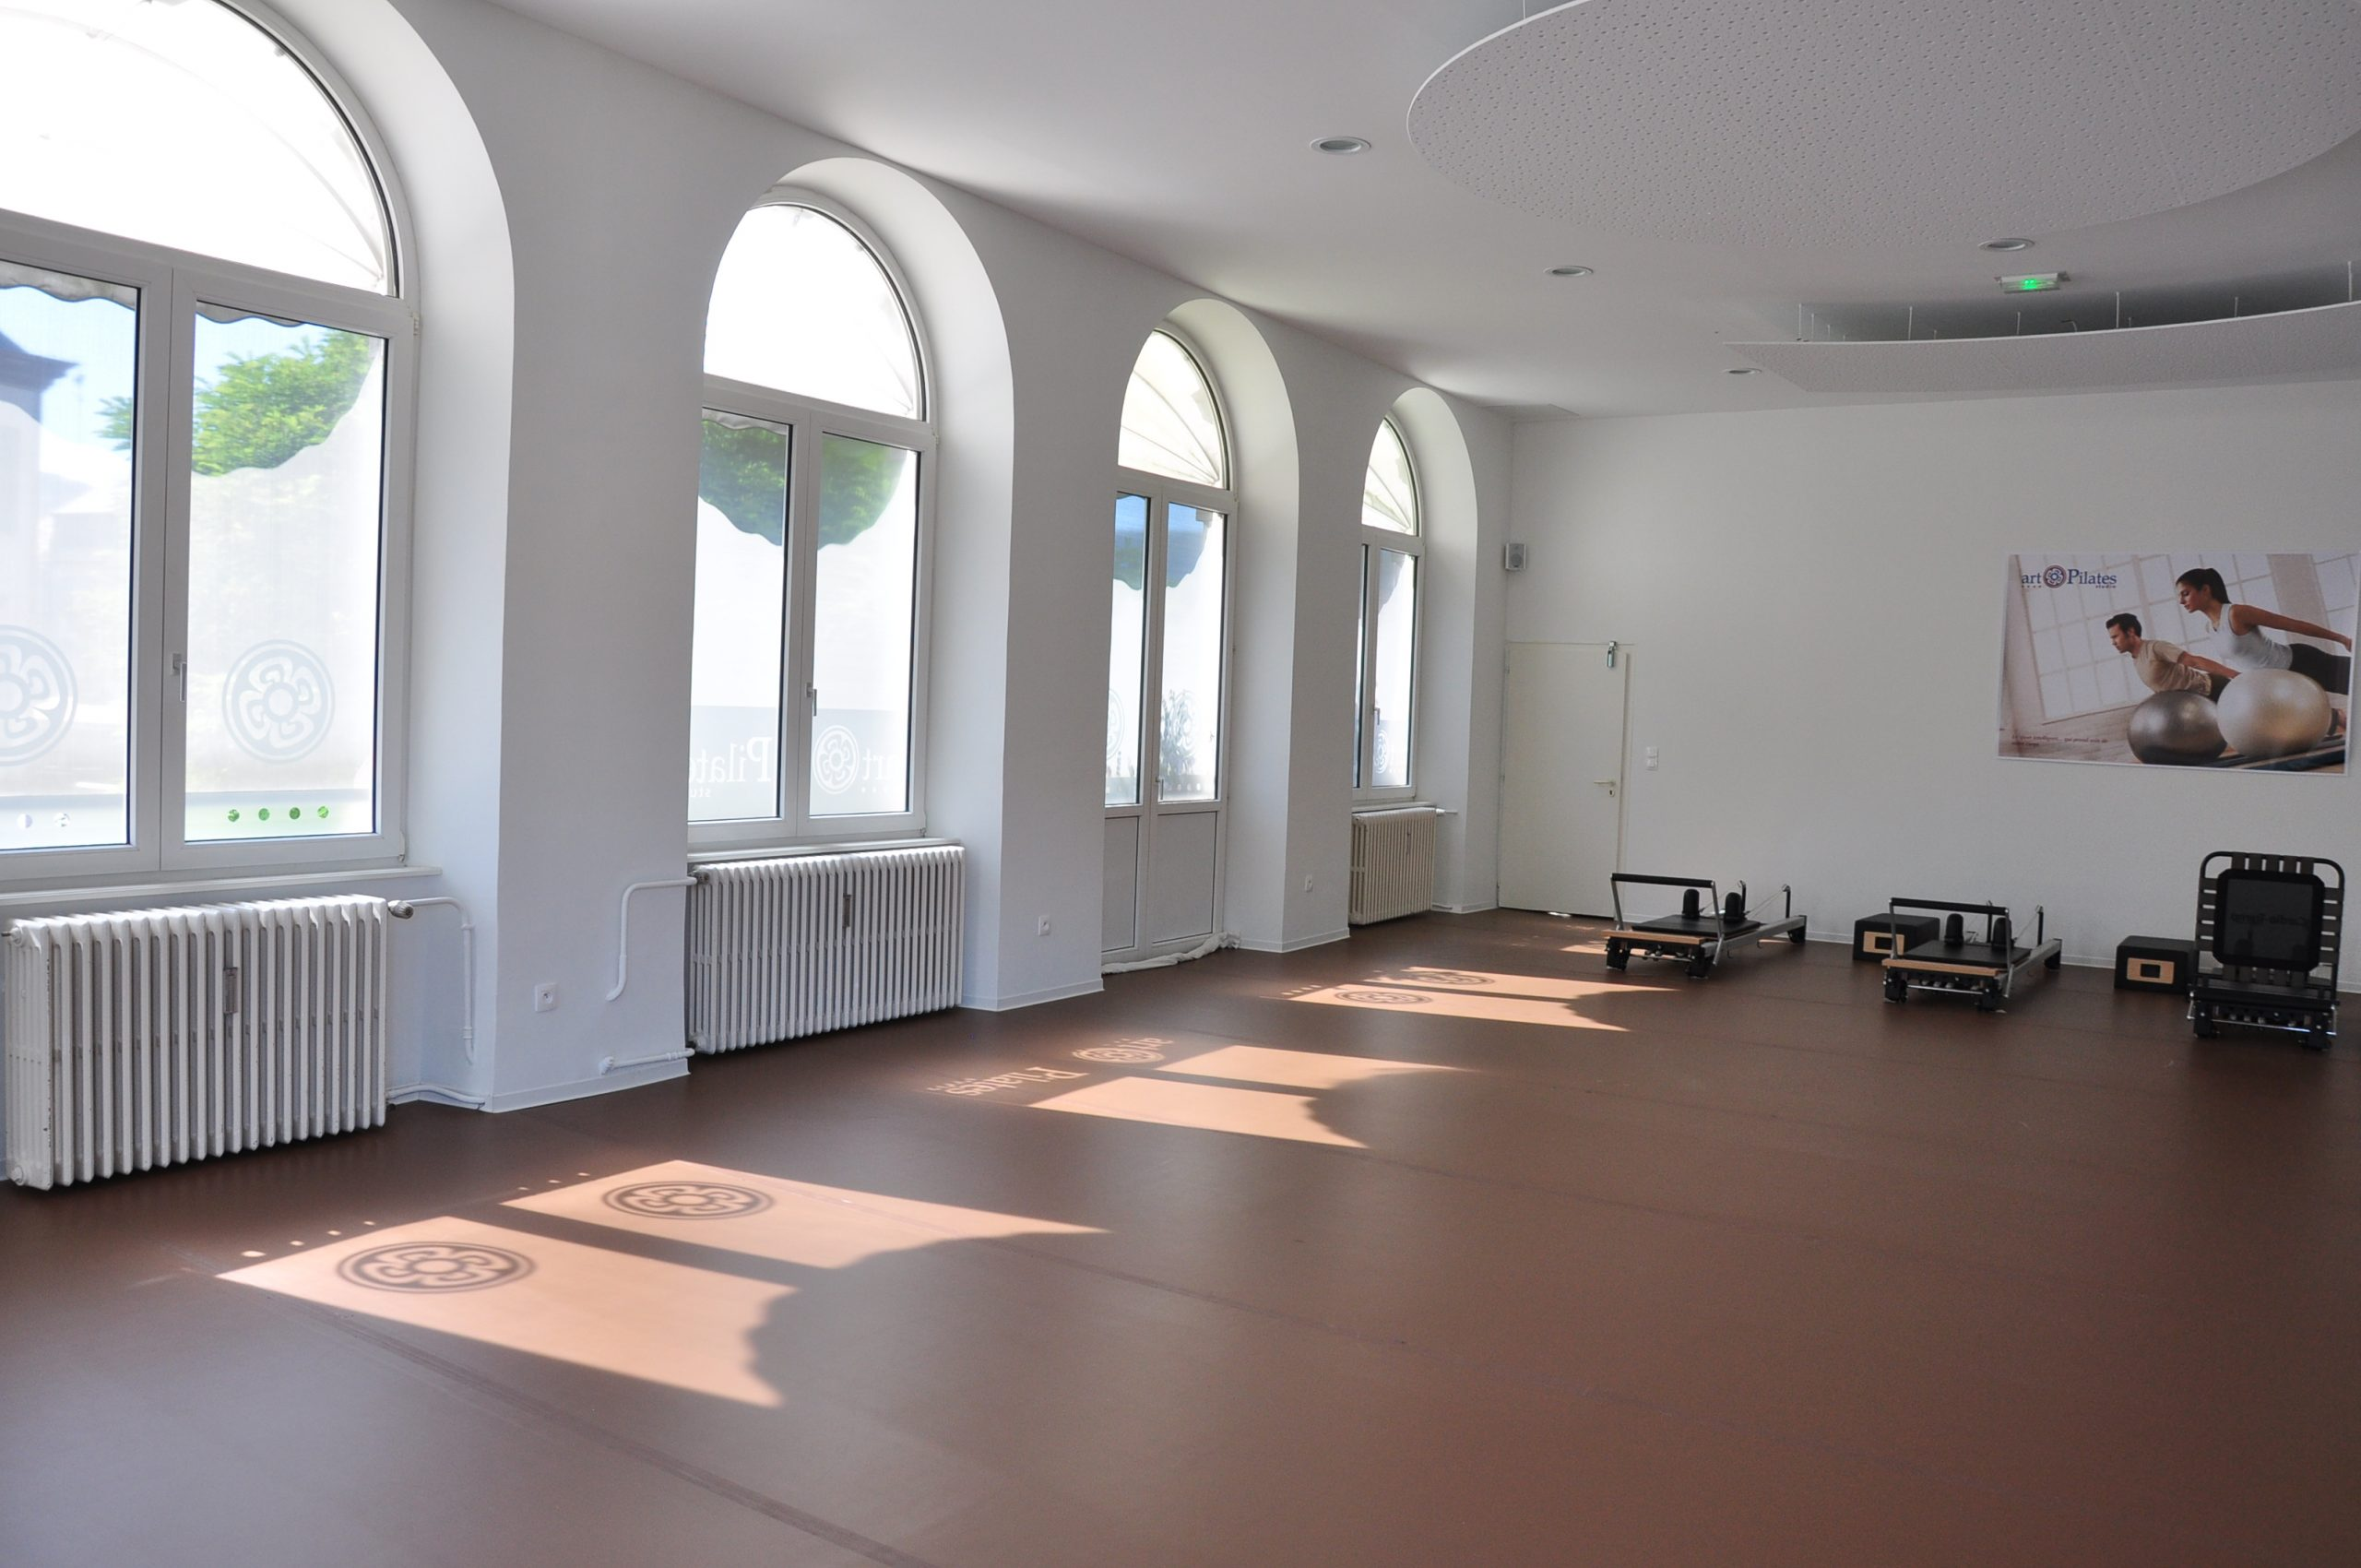 Studio artPilates